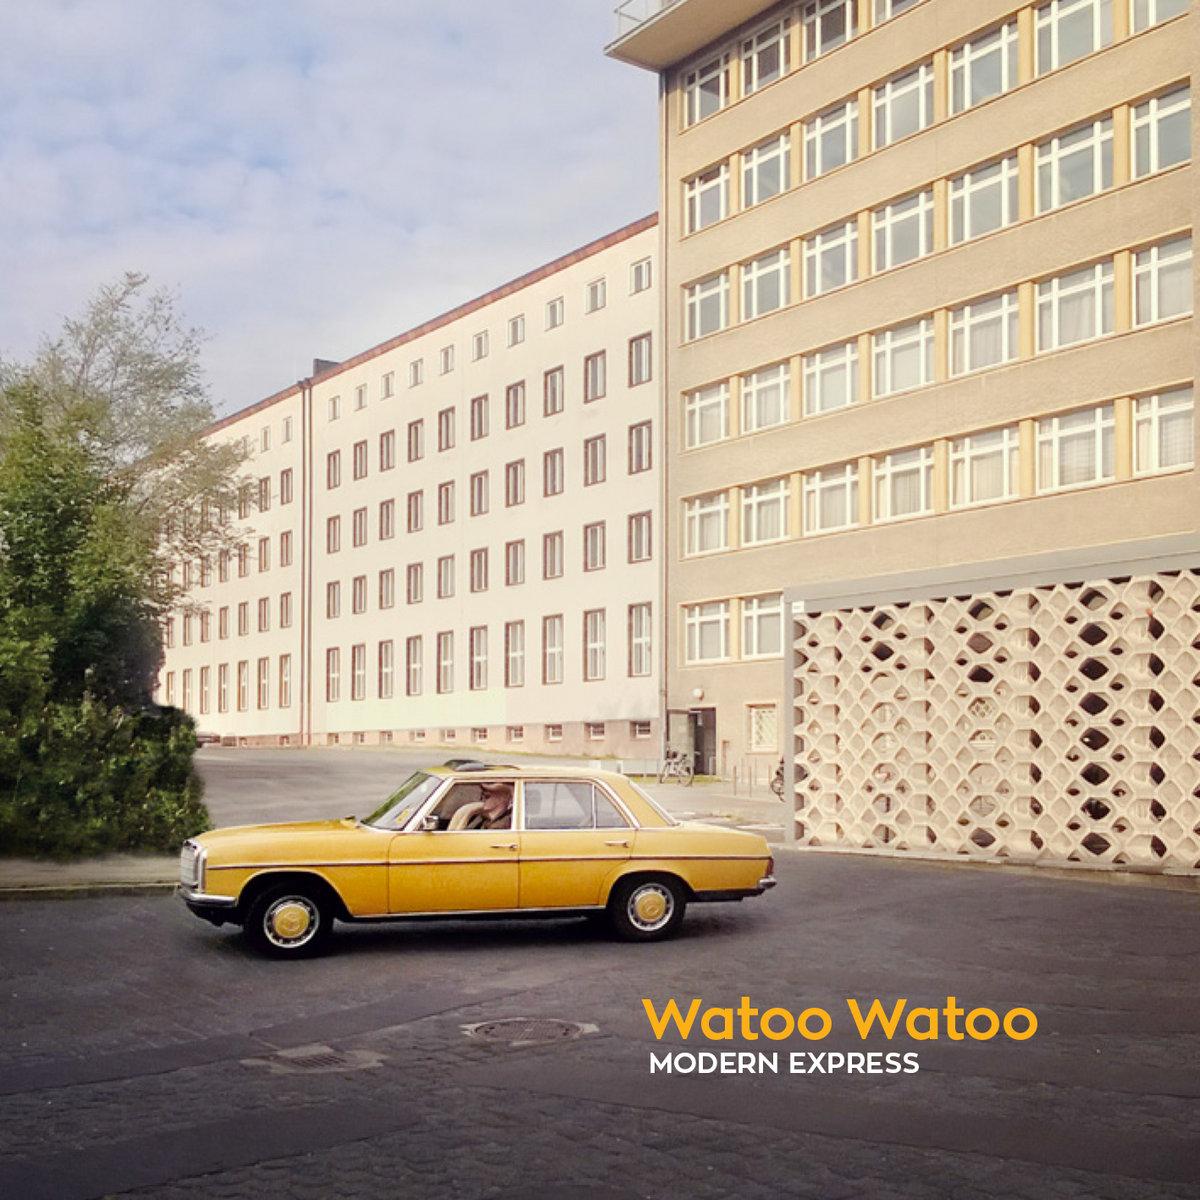 Watoo Watoo – Modern Express